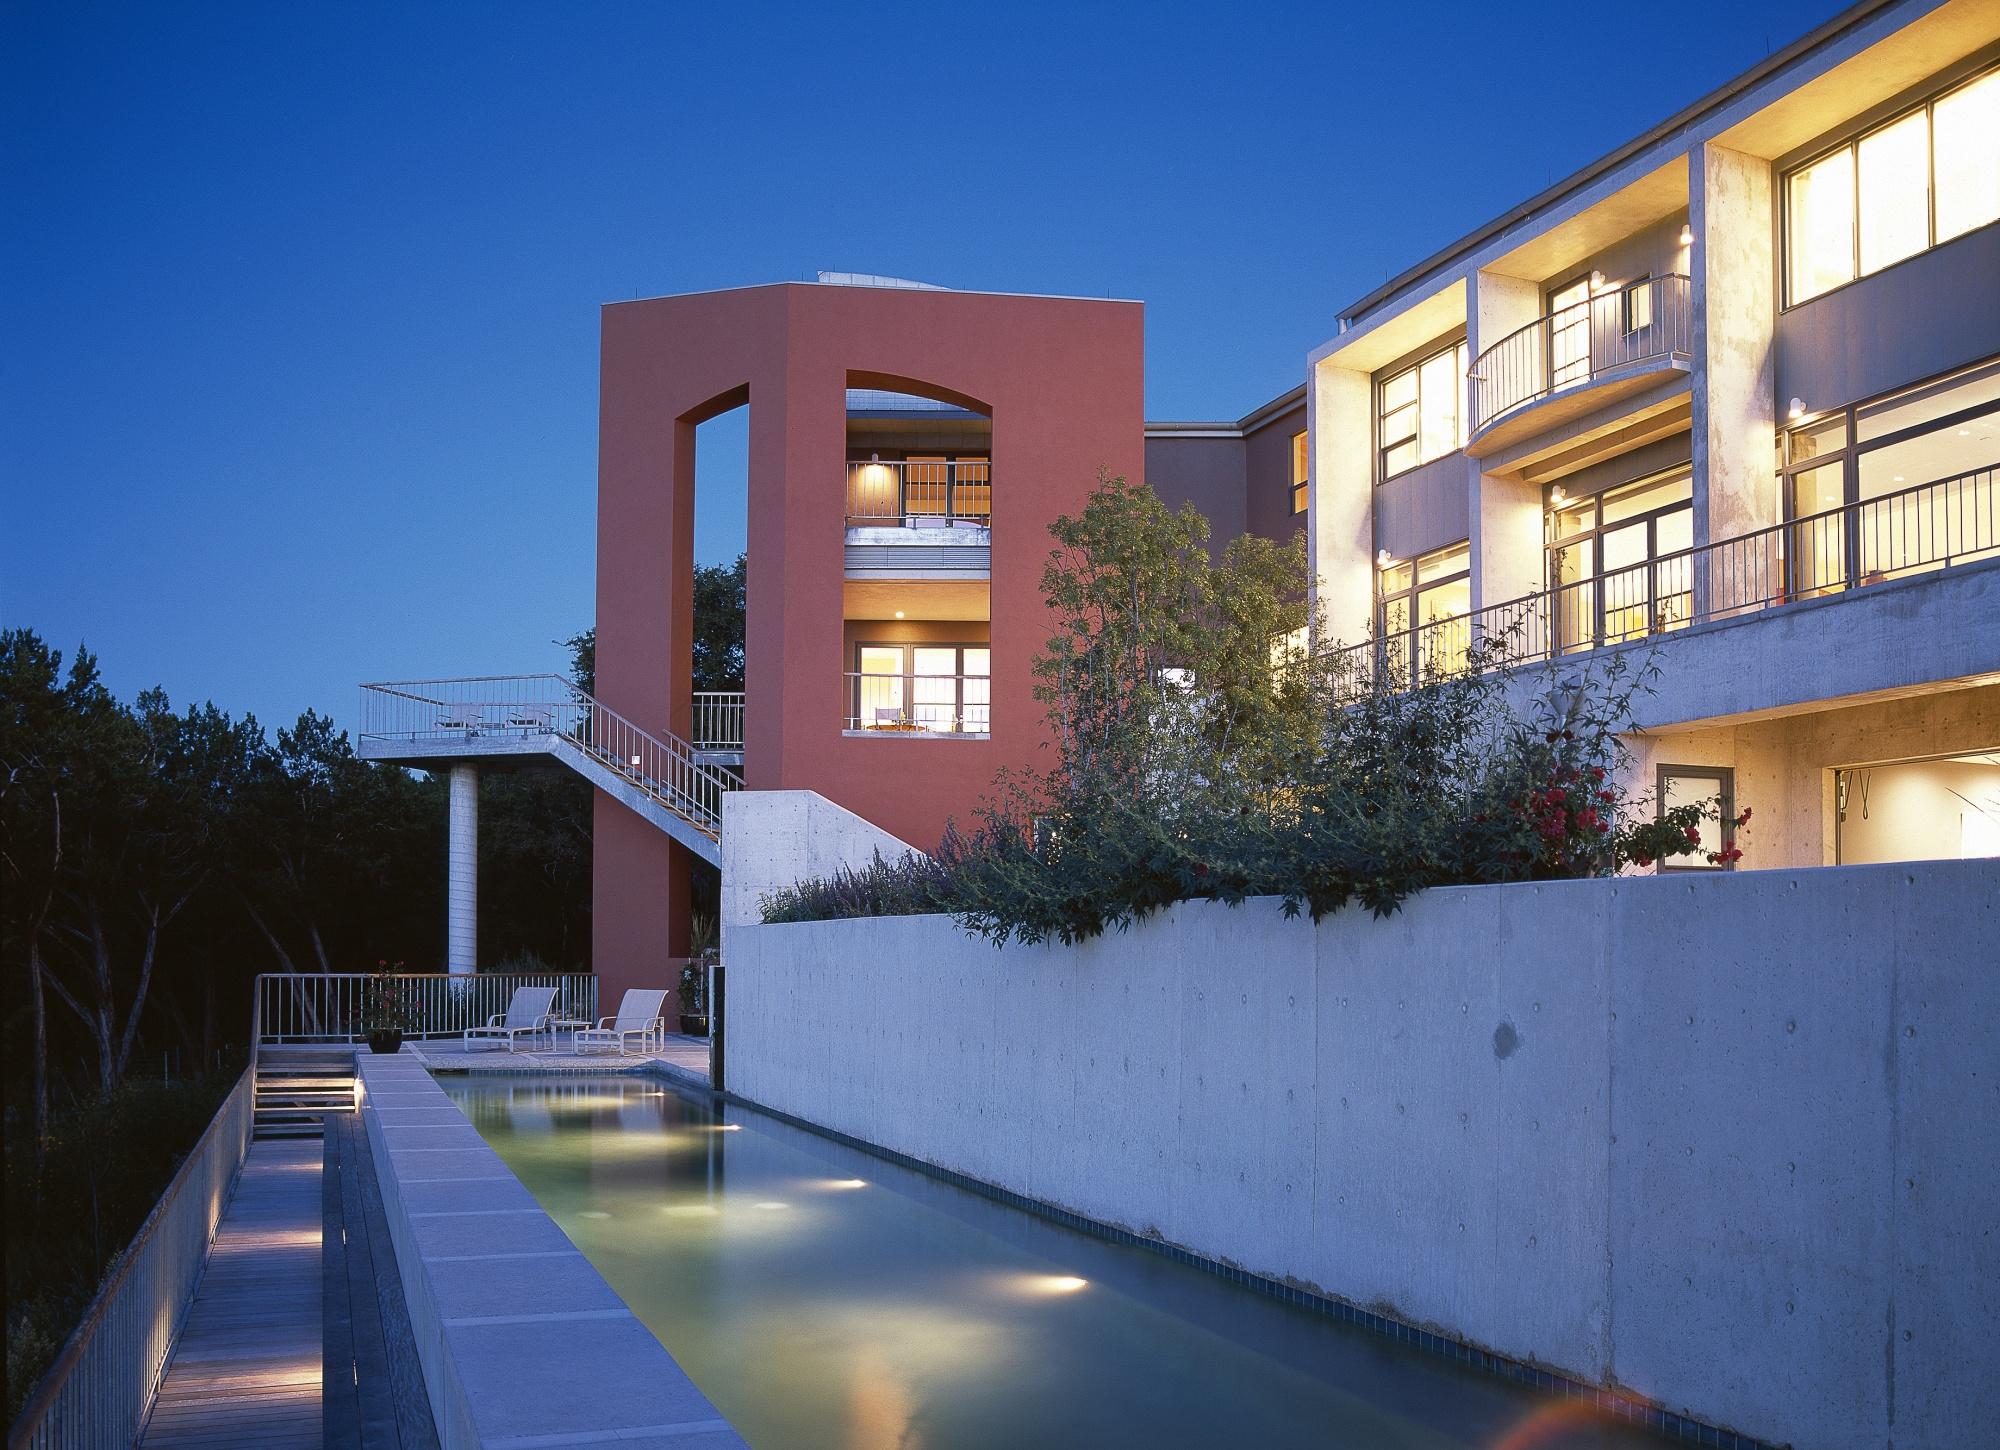 Concrete defines this lap pool.